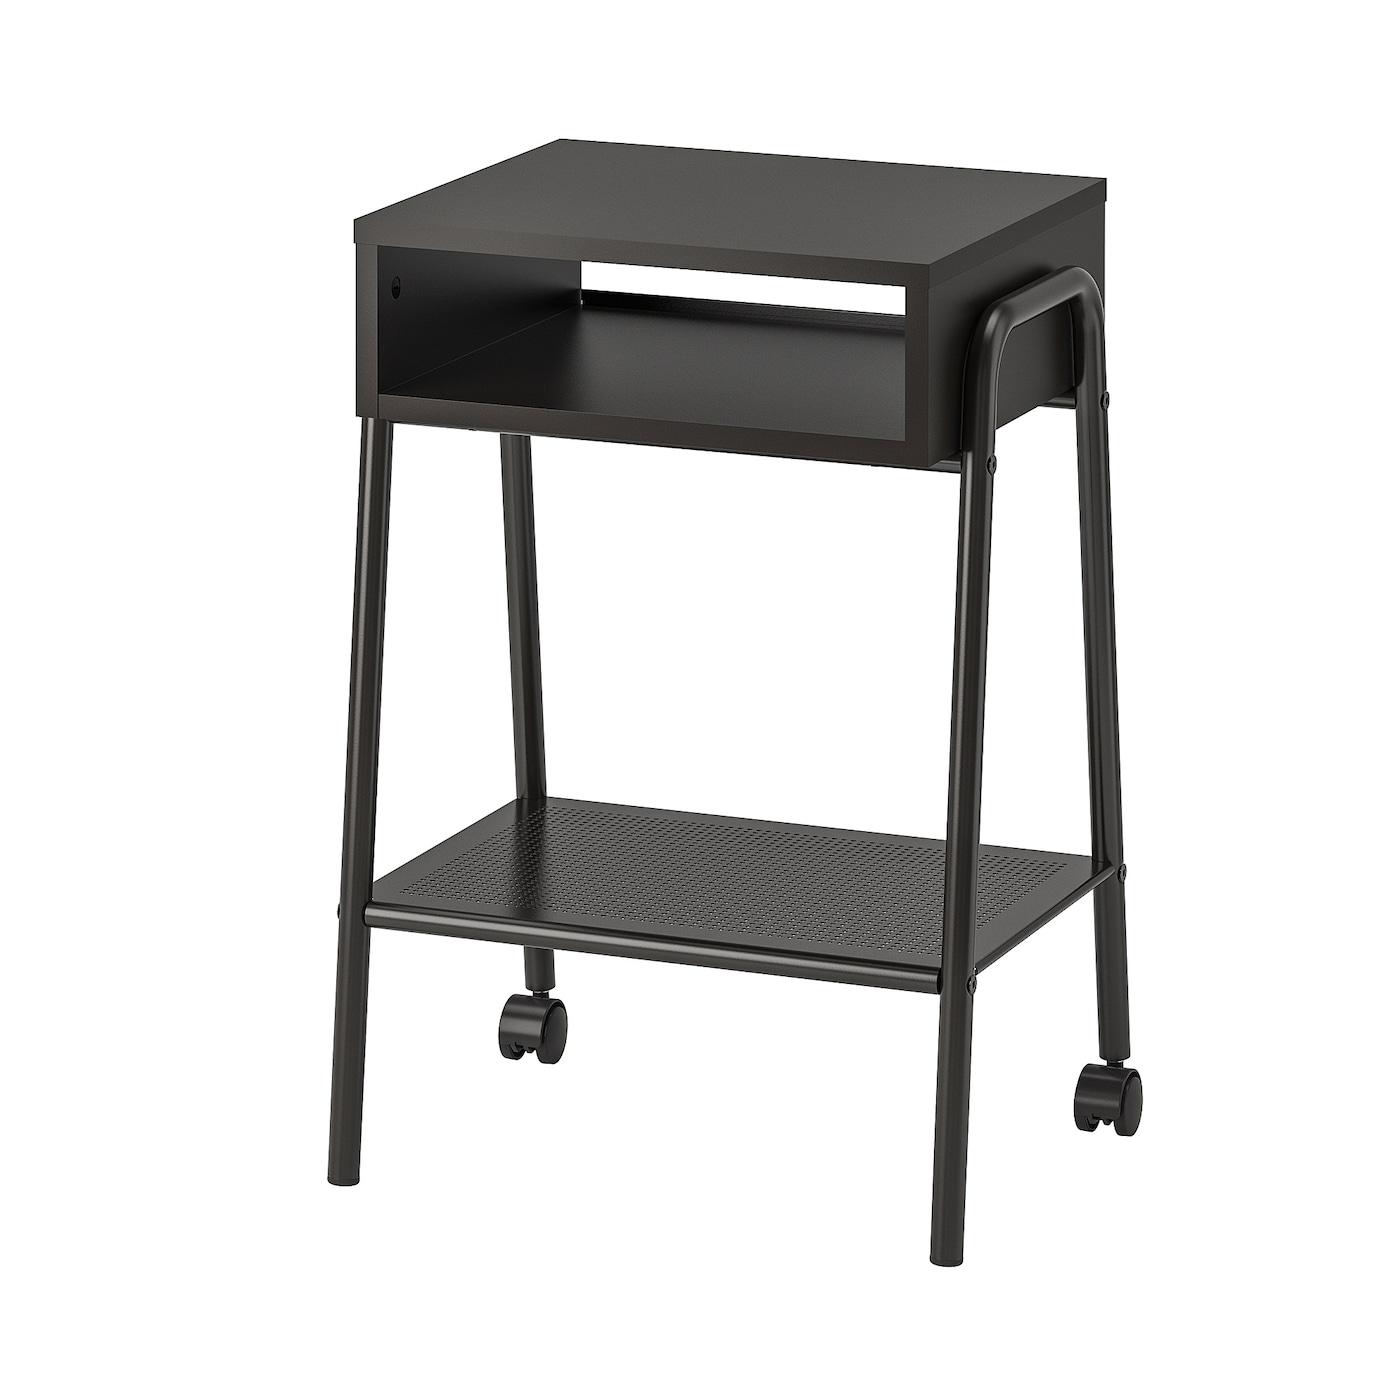 setskog table de chevet noir 45 x 35 cm - ikea